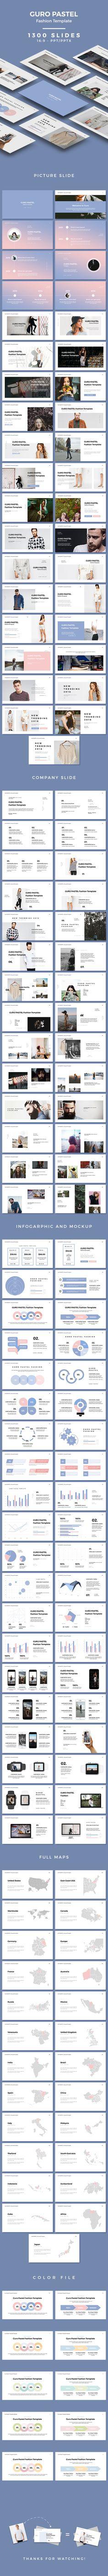 GURO Pastel - Fashion Template (PowerPoint Templates)